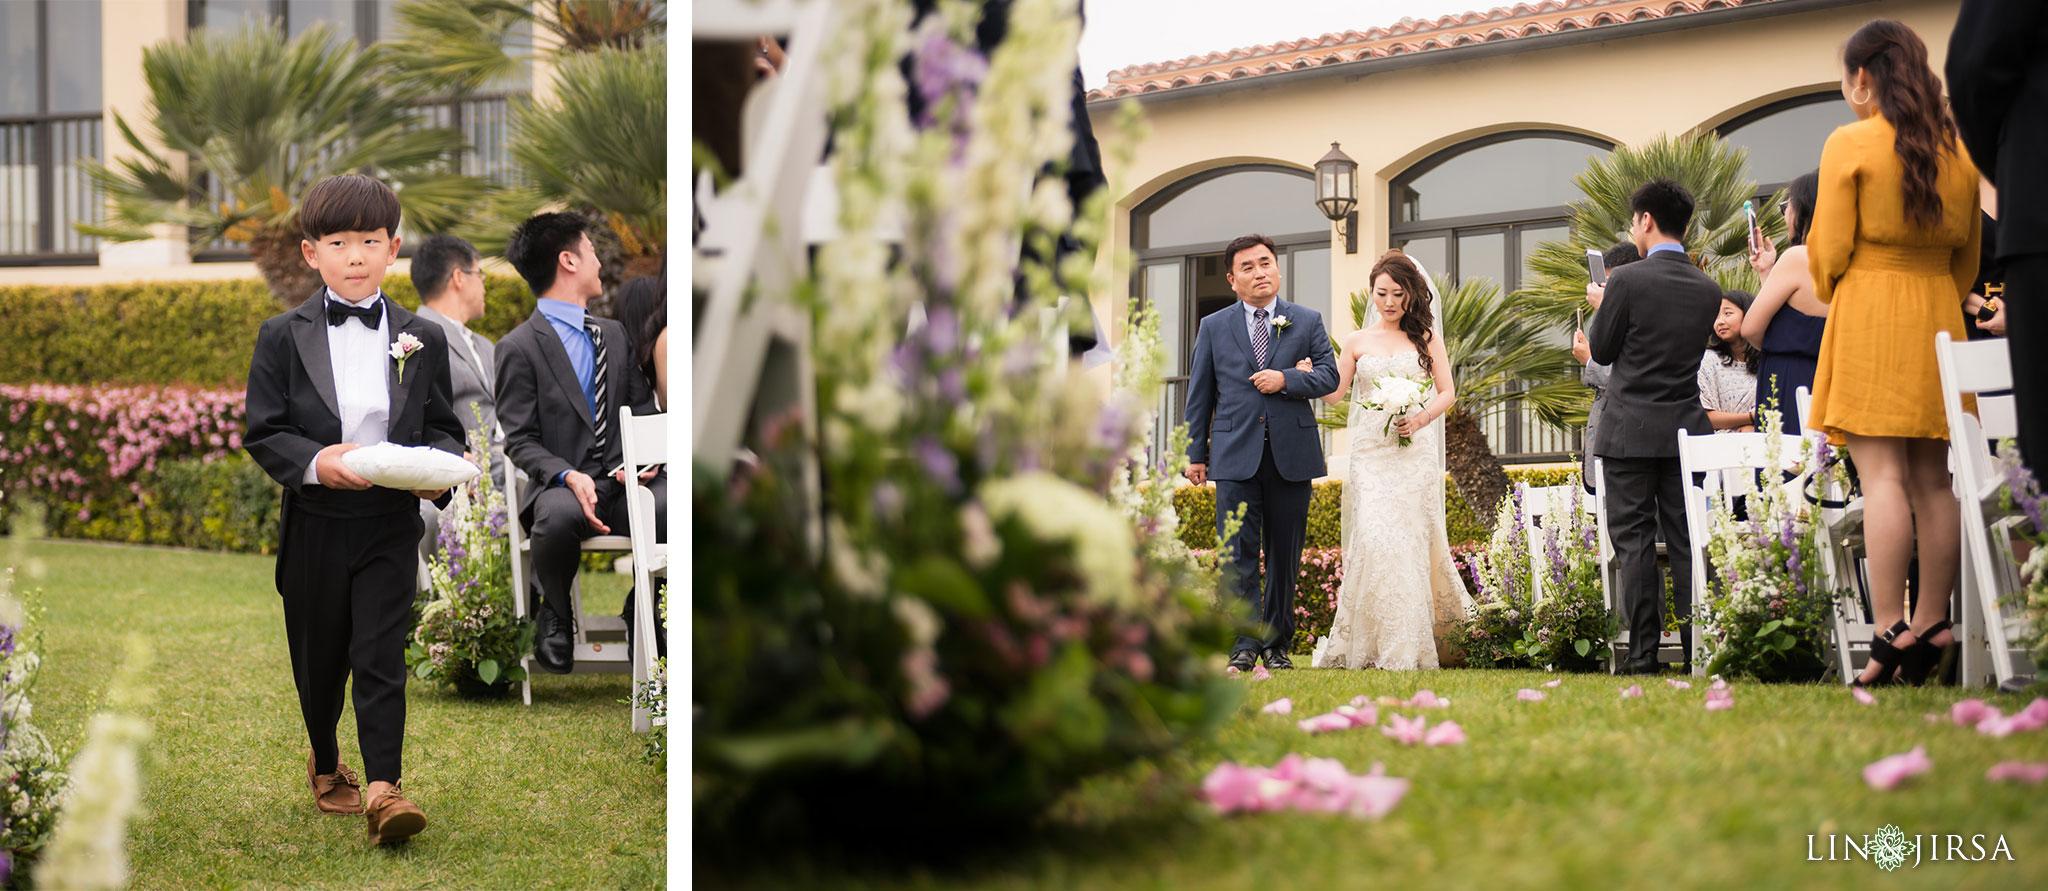 16 trump national golf club rancho palos verdes wedding ceremony photography